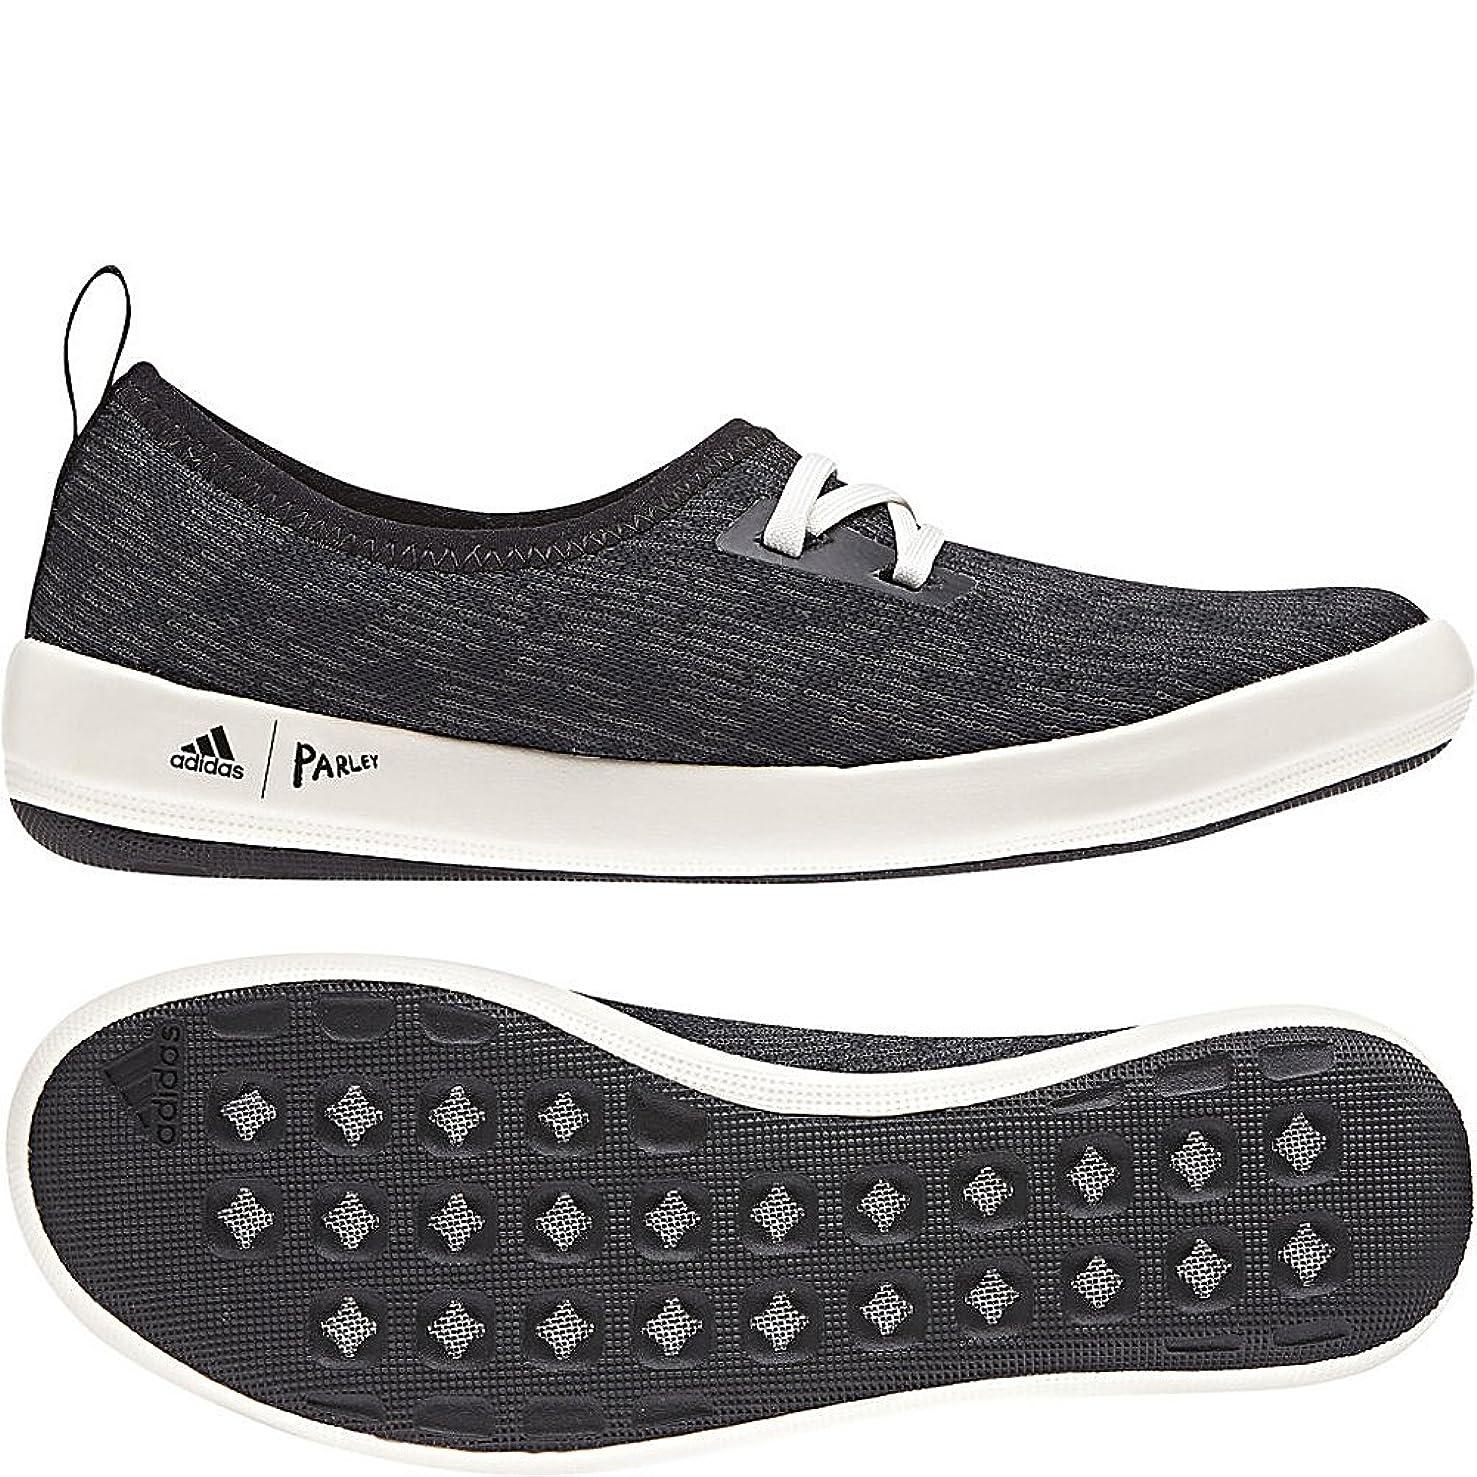 adidas outdoor Women's Terrex CC Boat Sleek Parley Black/Carbon/Chalk White 7 B US